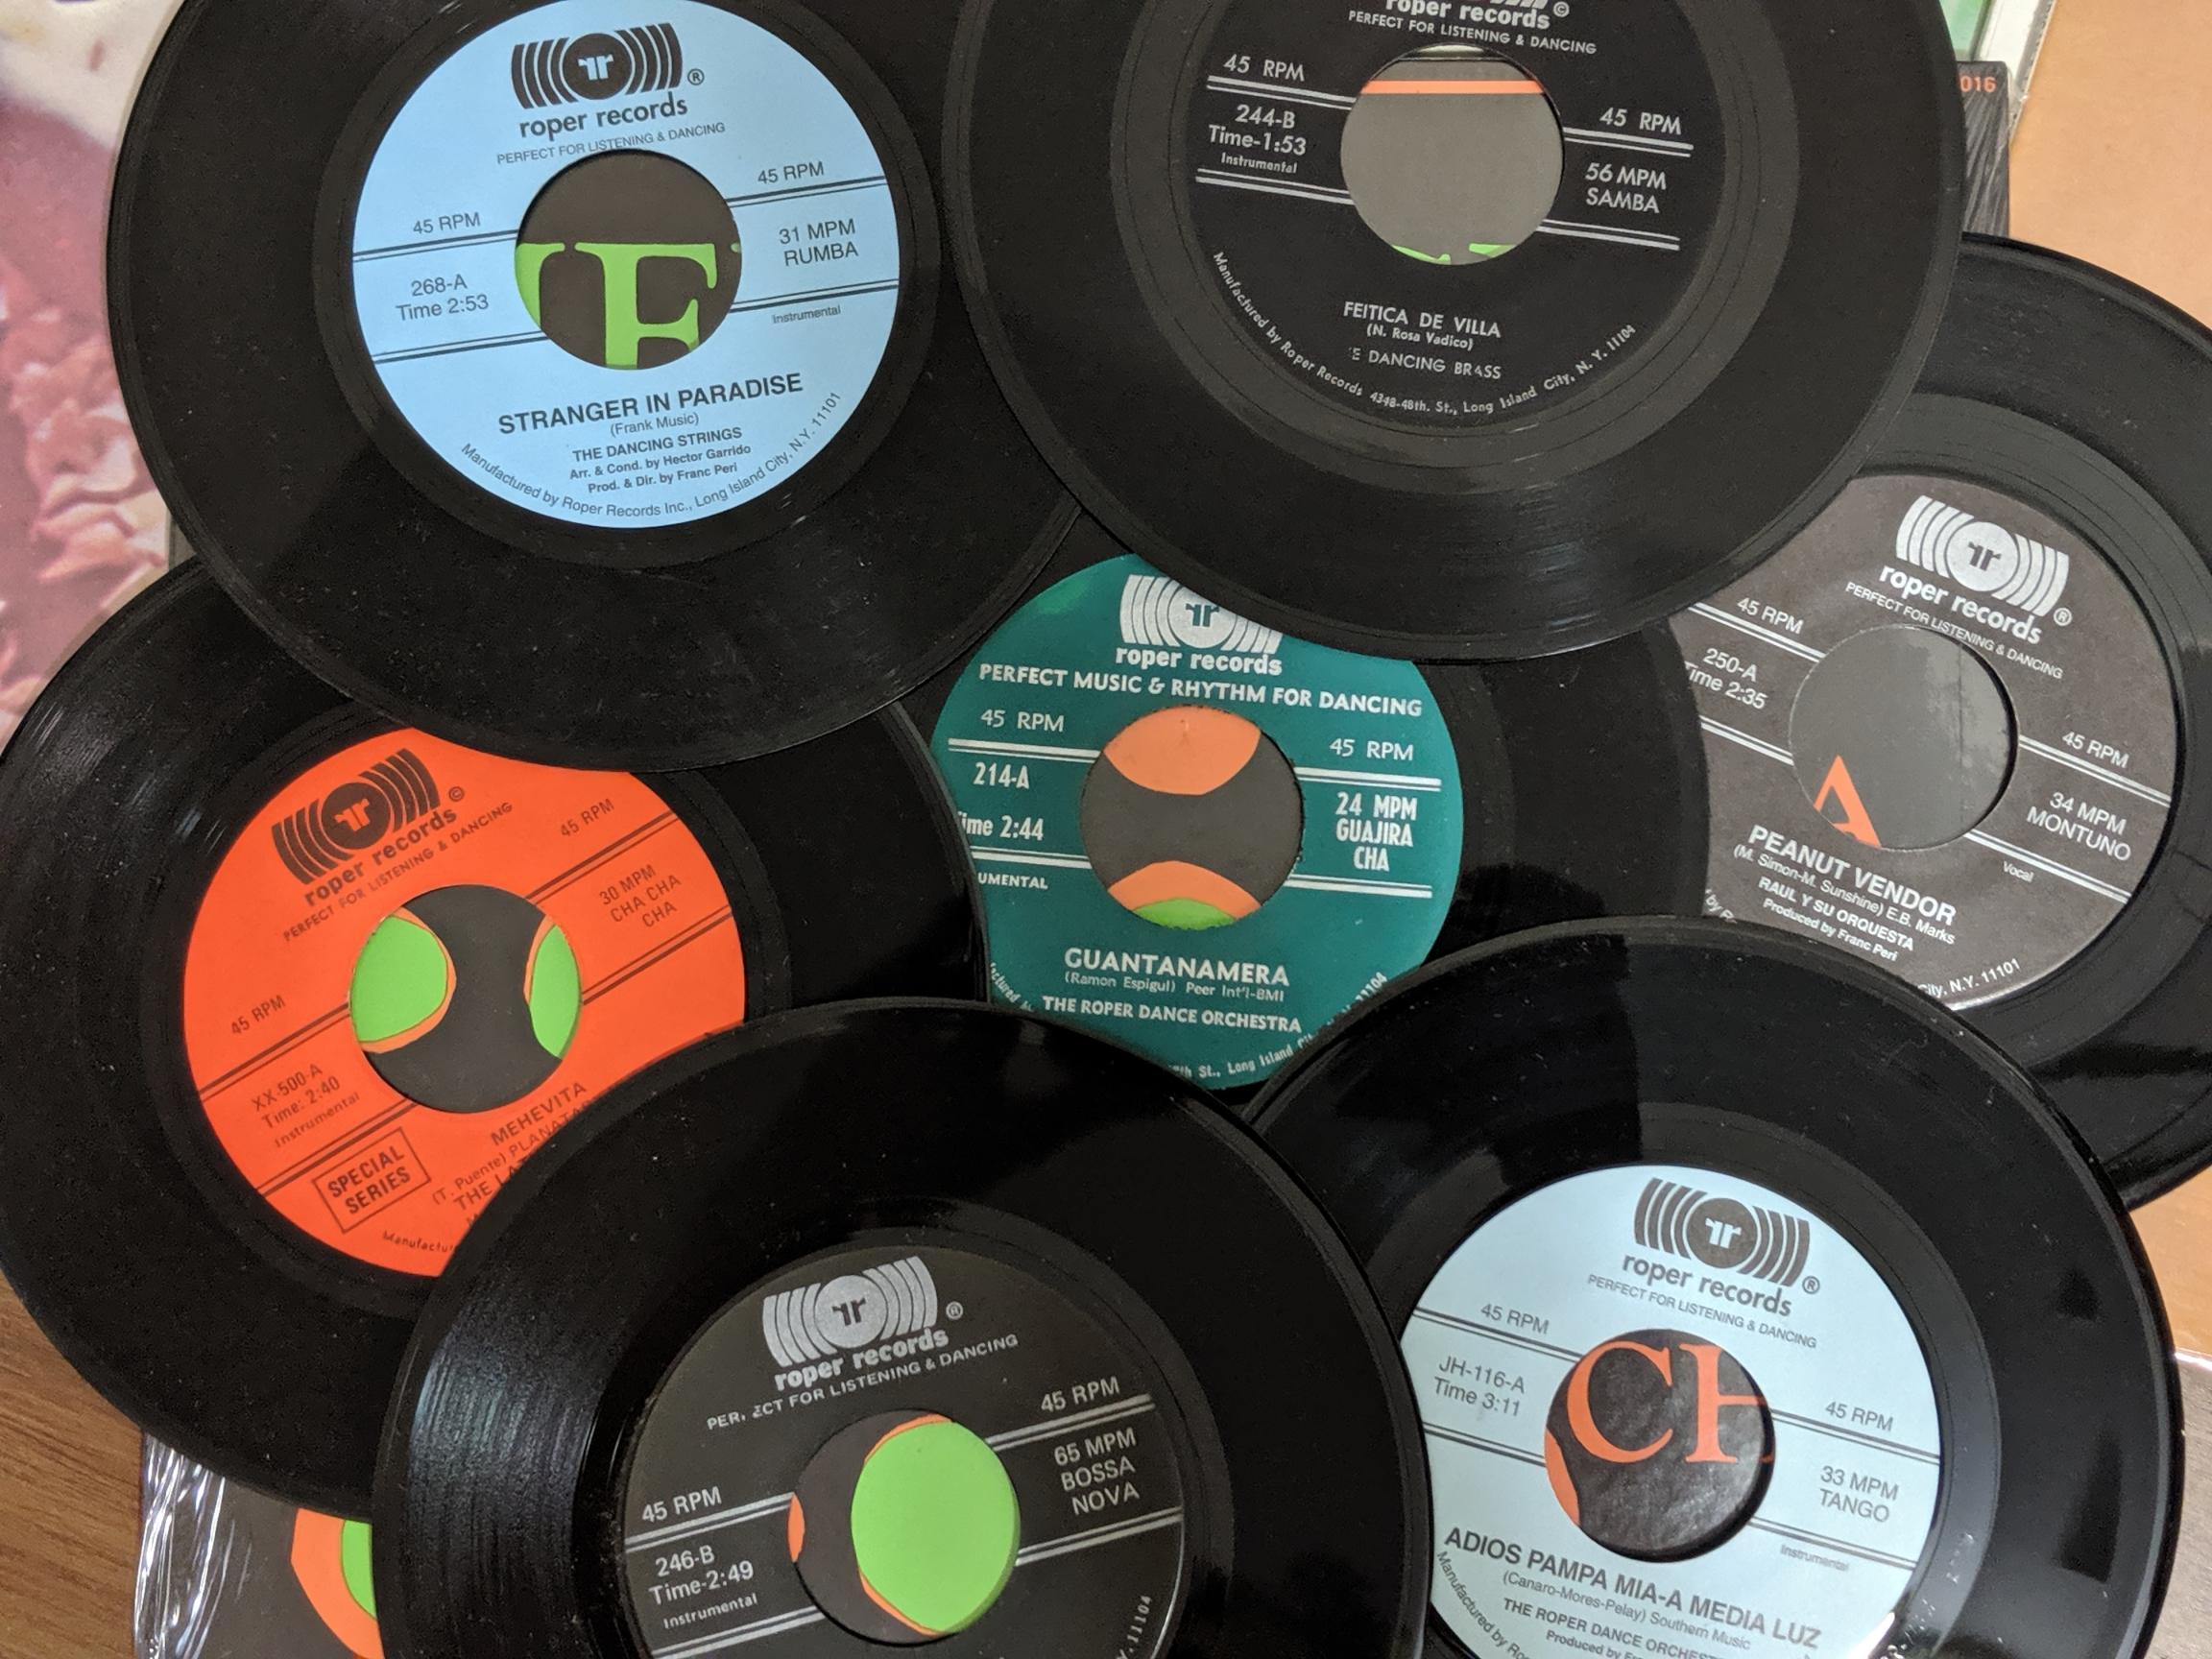 Multiple Roper Records